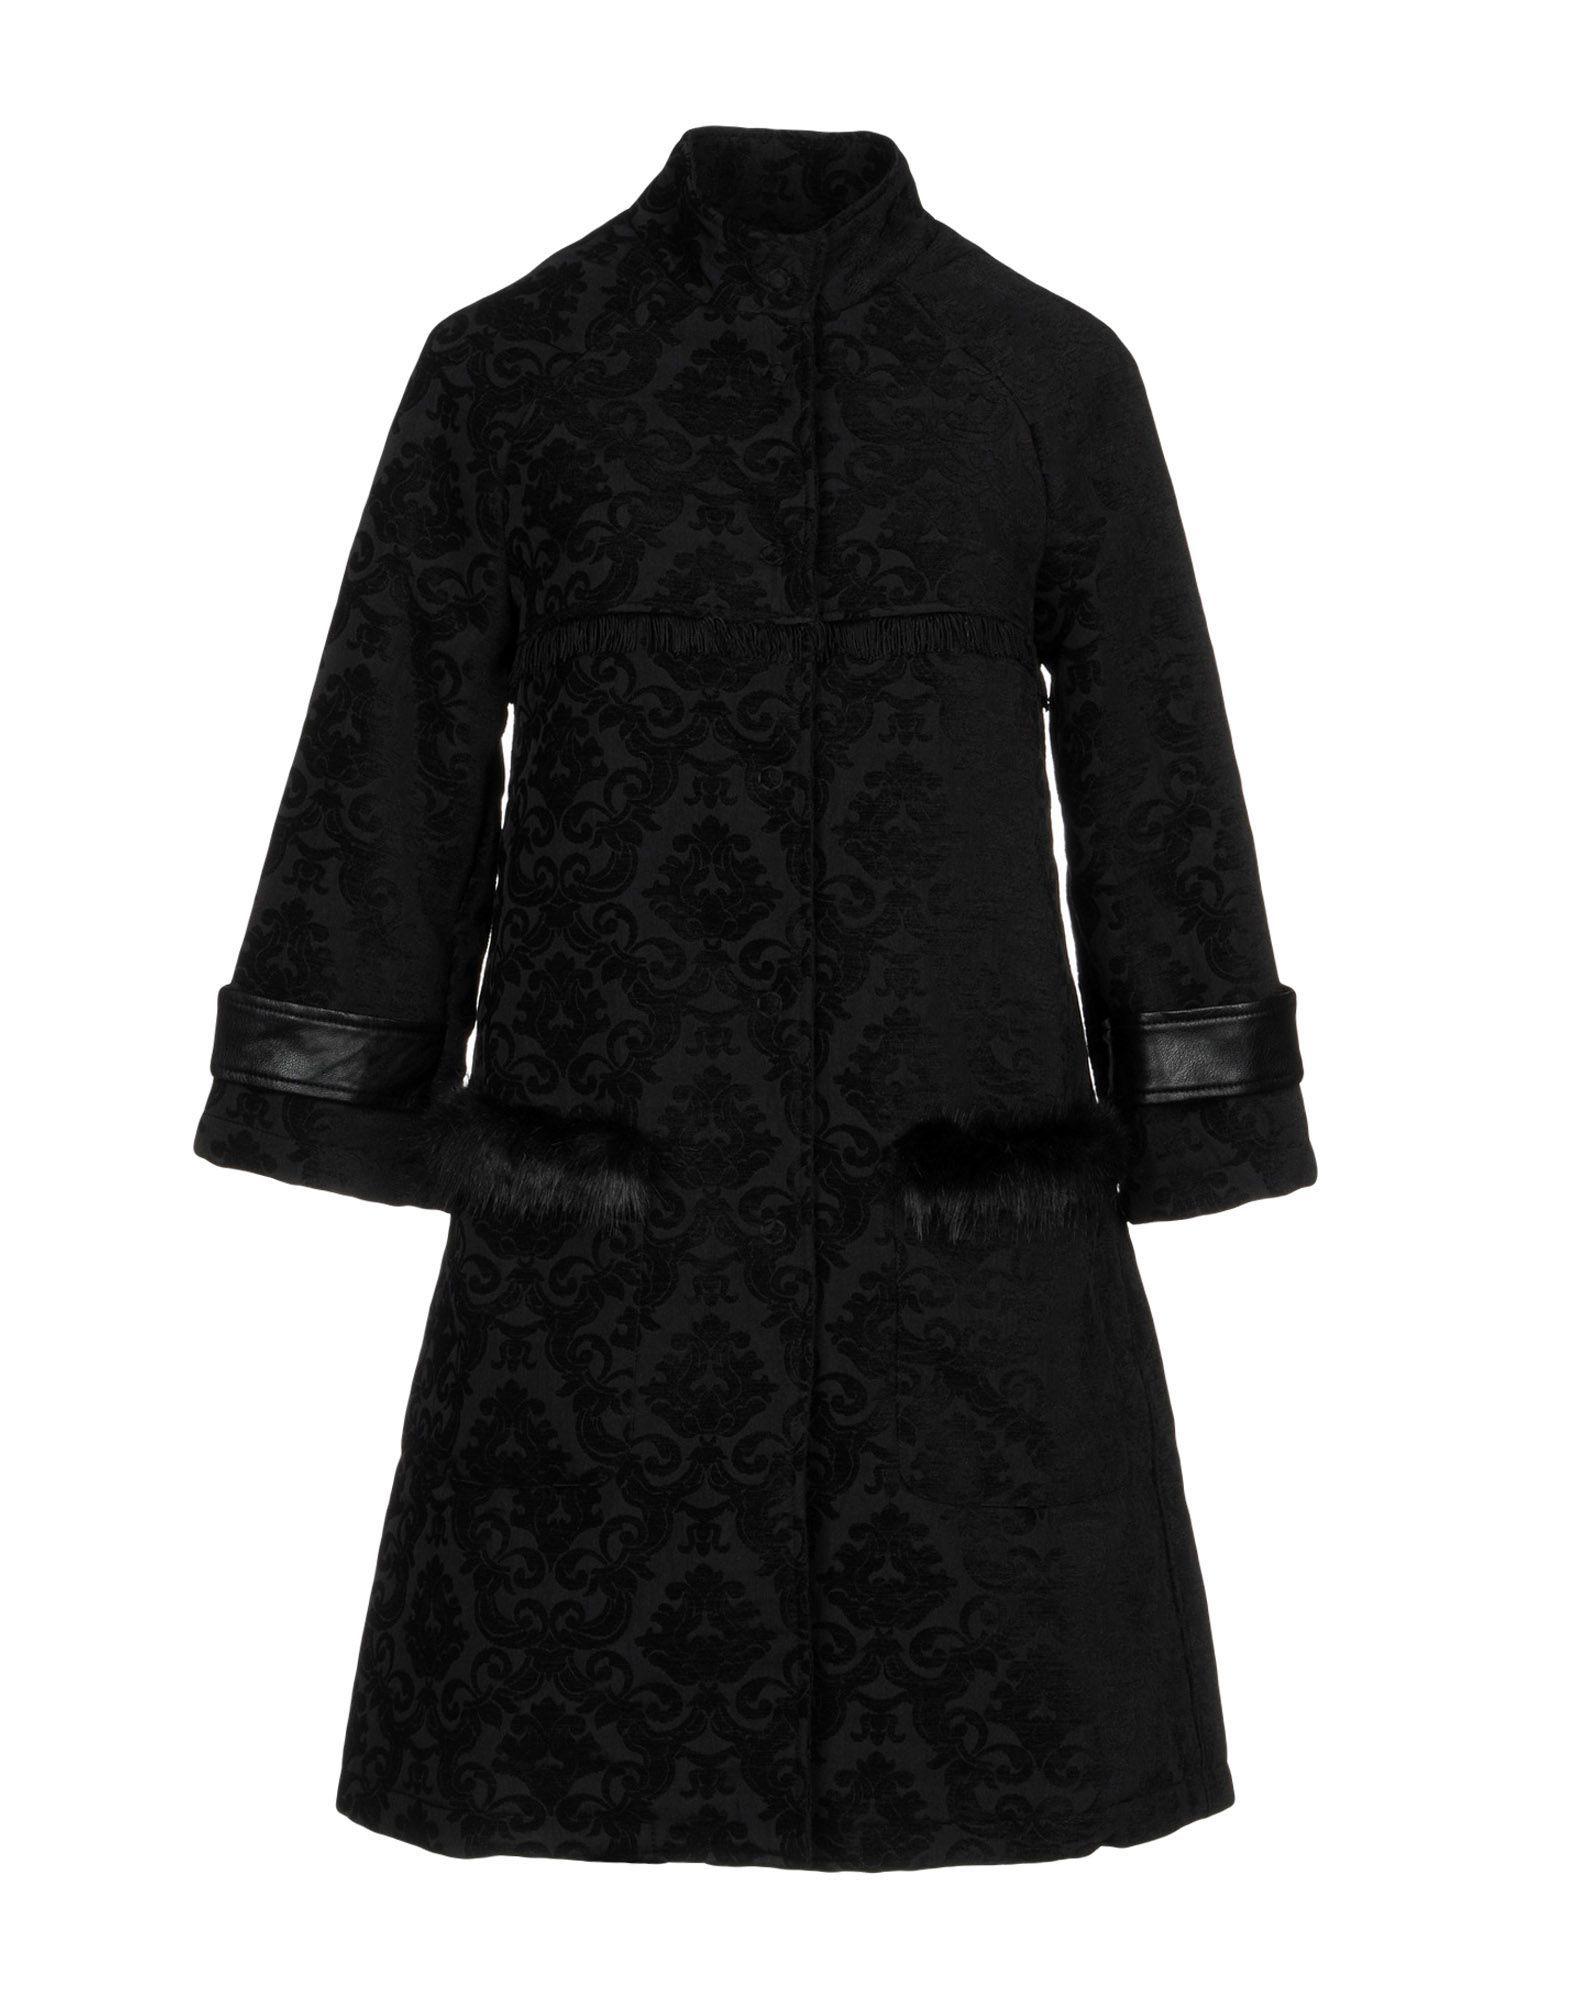 Fornarina Black Faux Fur Overcoat